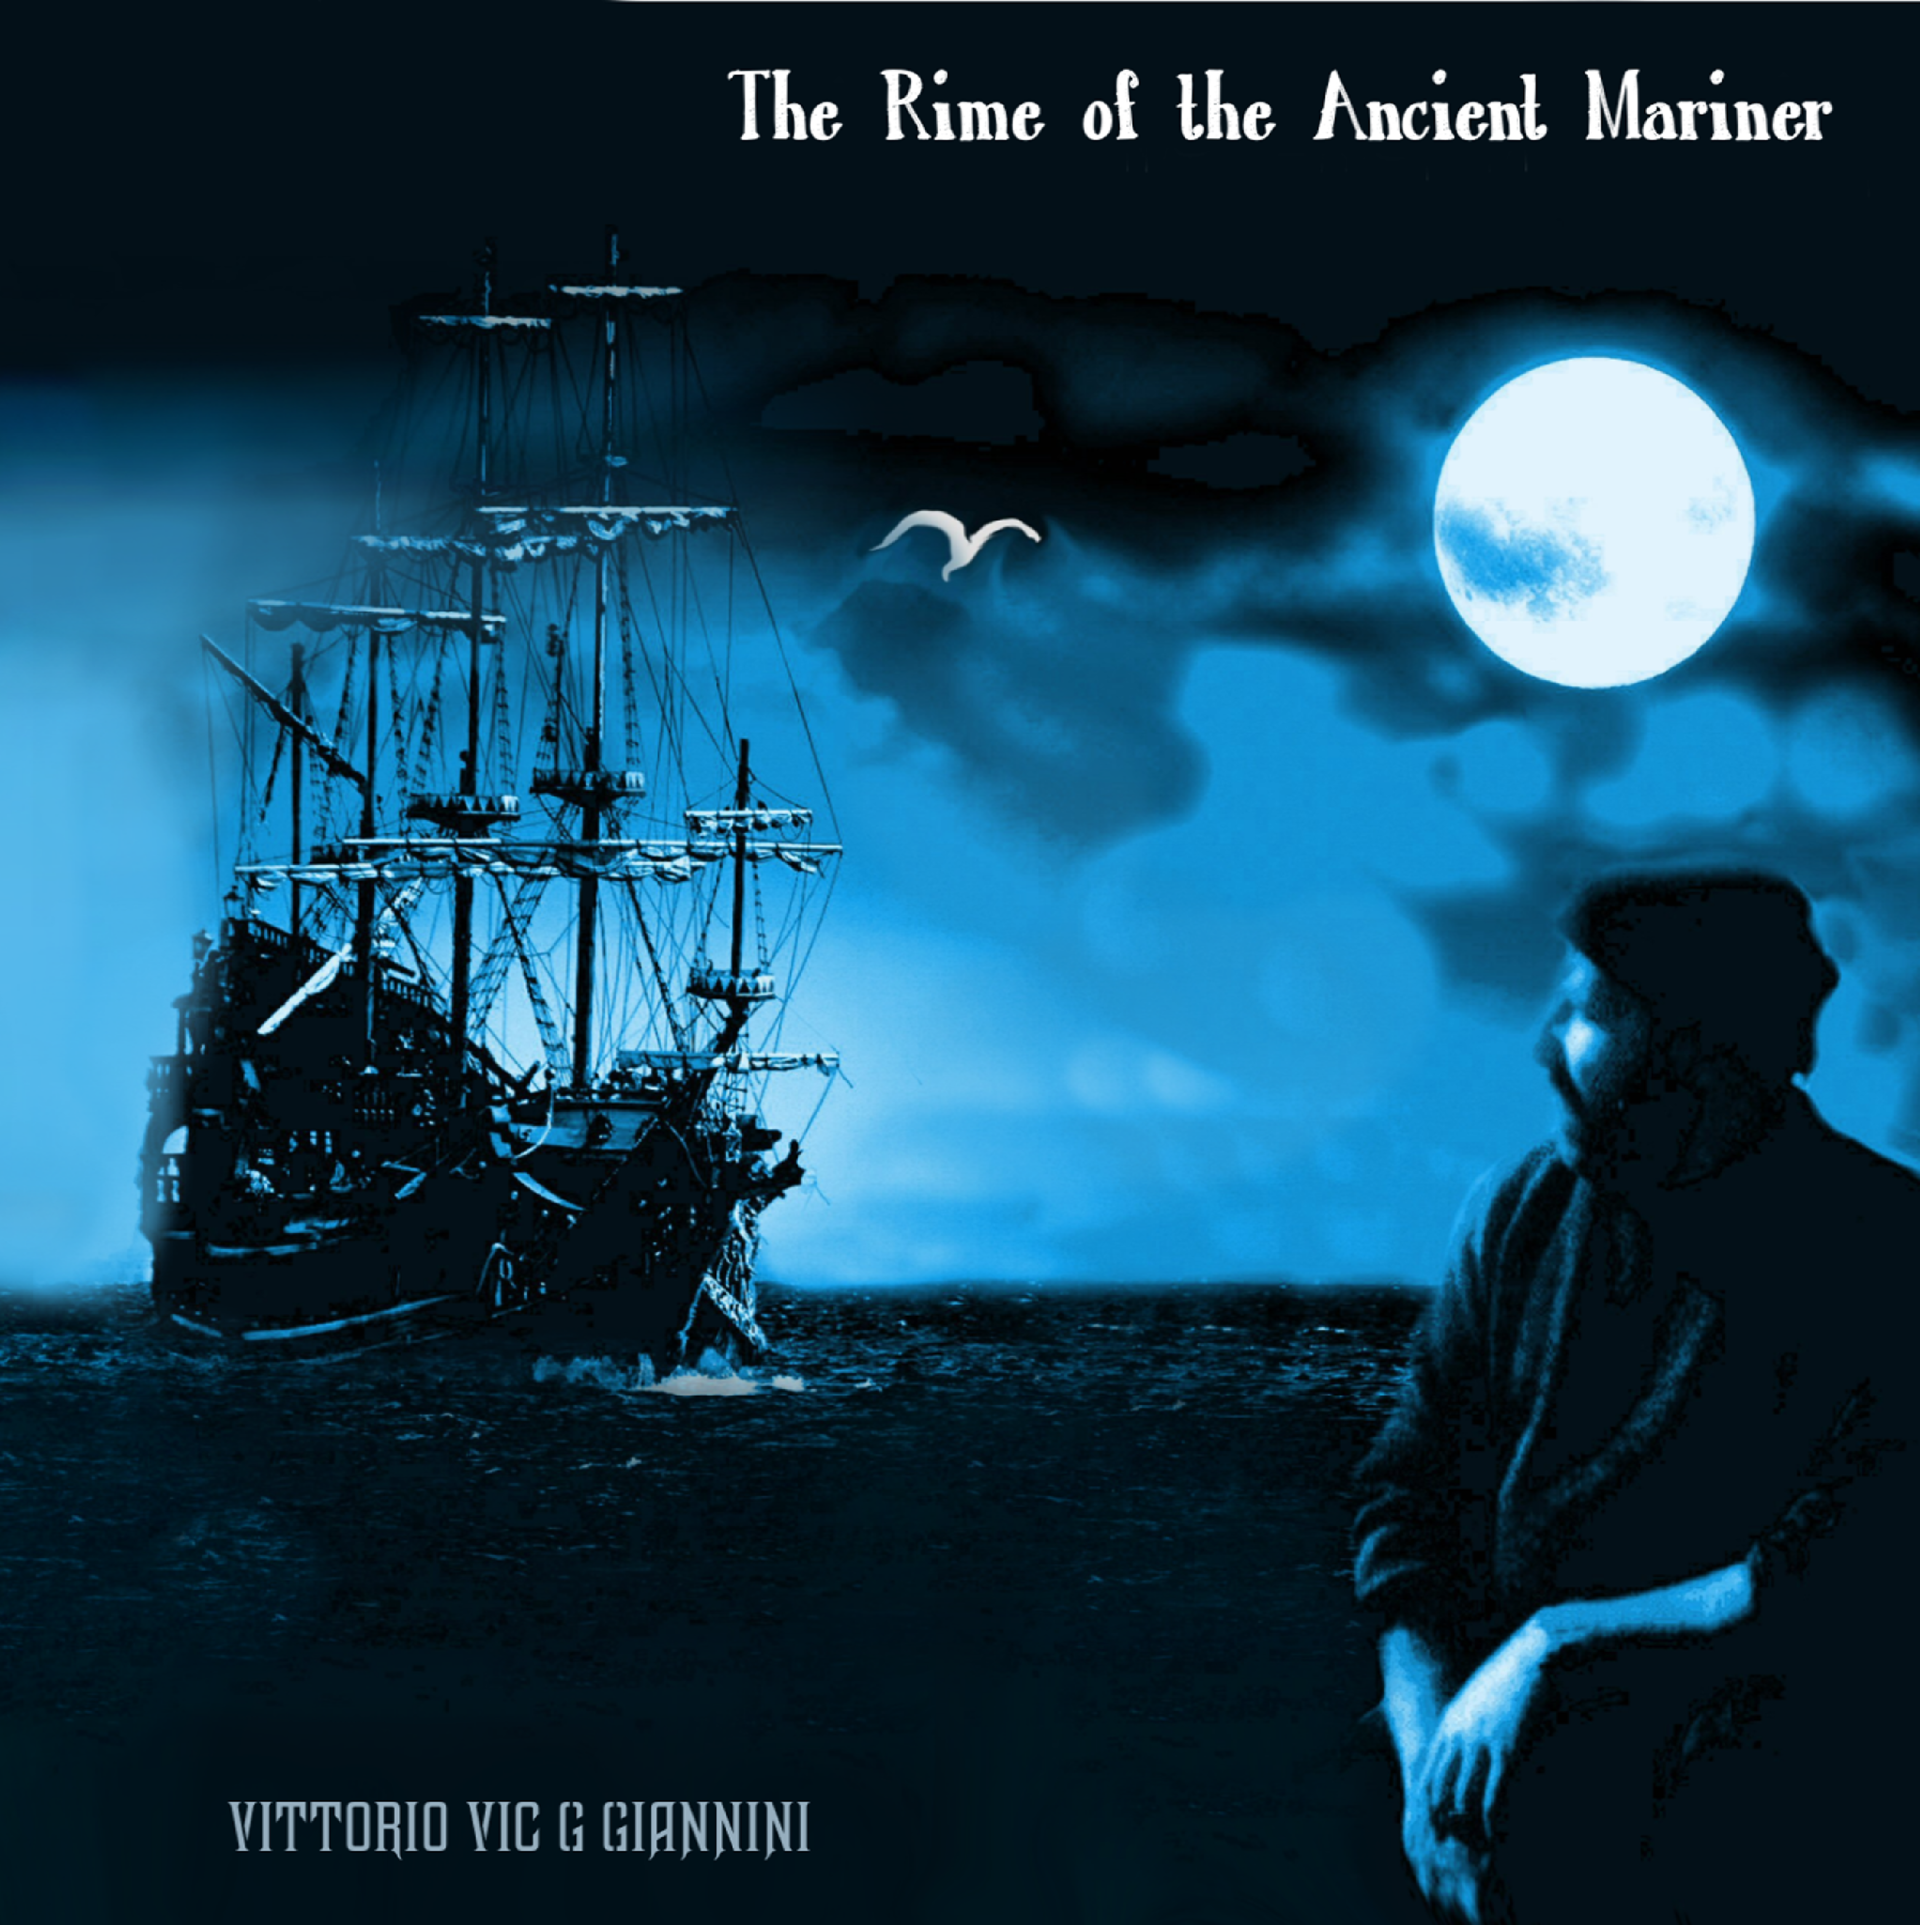 Copertina del CD The Rime of the Ancient Mariner di Vic Giannini